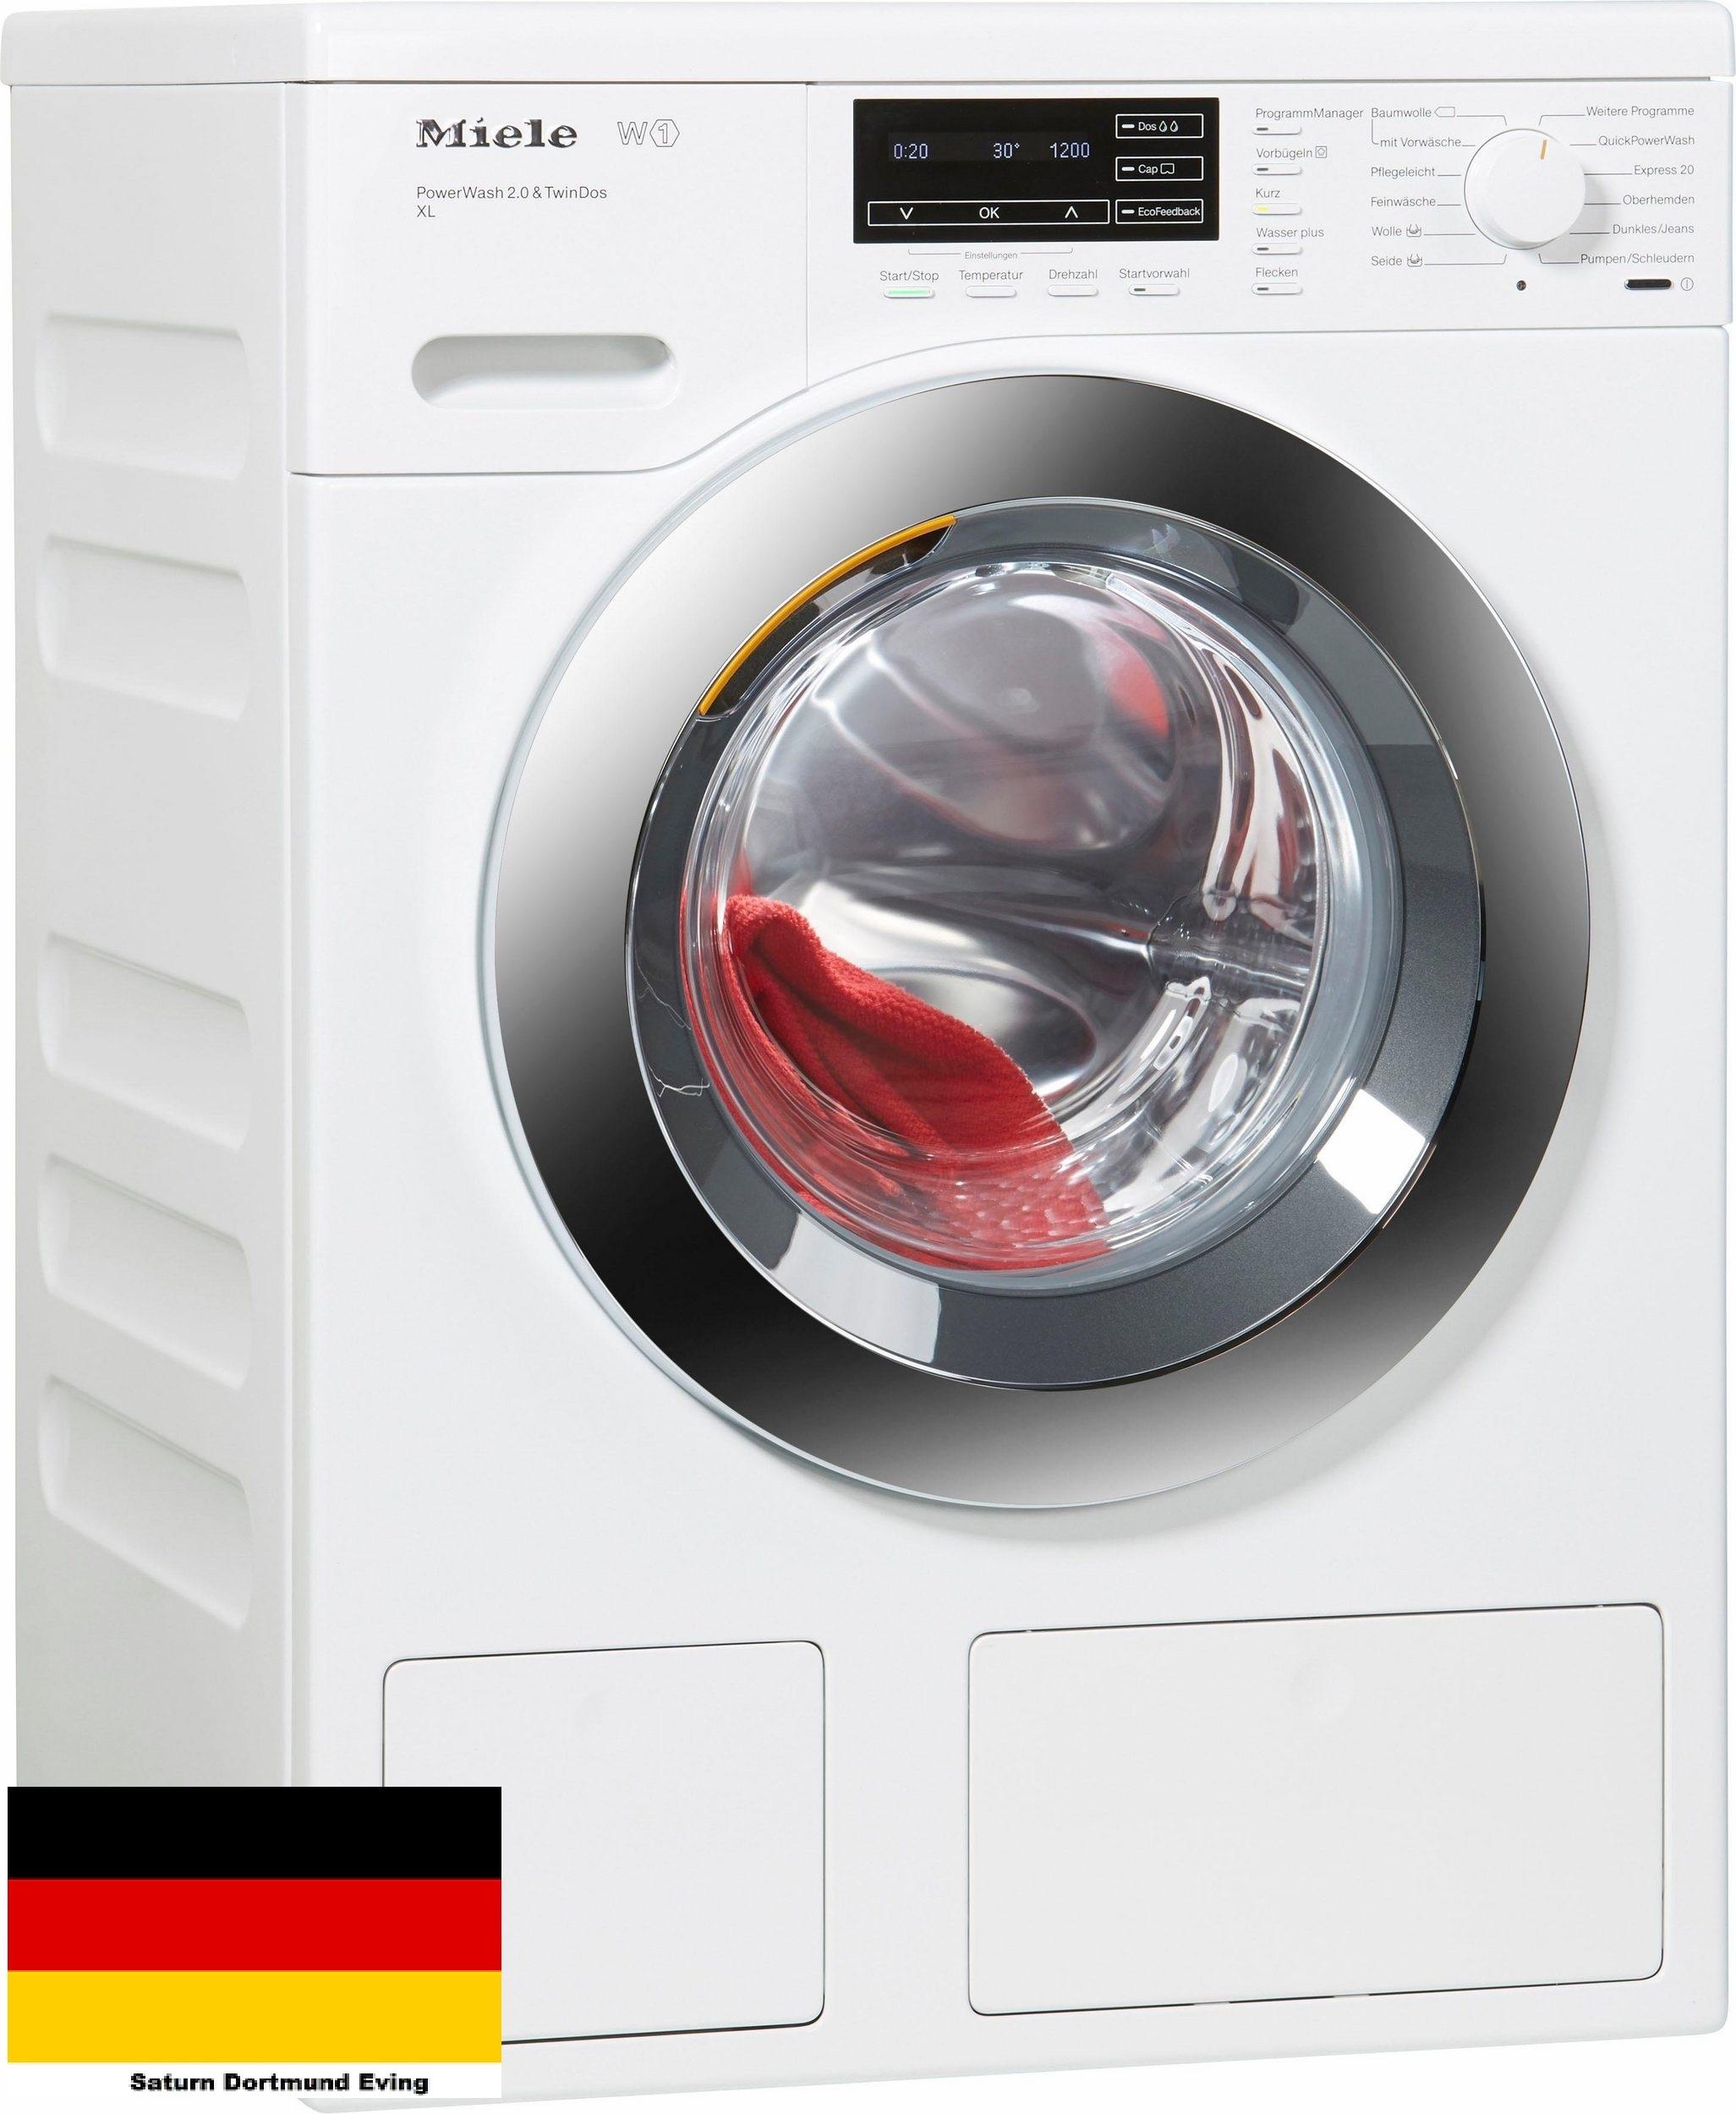 miele wkh 122 wps waschmaschine 9 kg 1600 u min a neu ebay. Black Bedroom Furniture Sets. Home Design Ideas